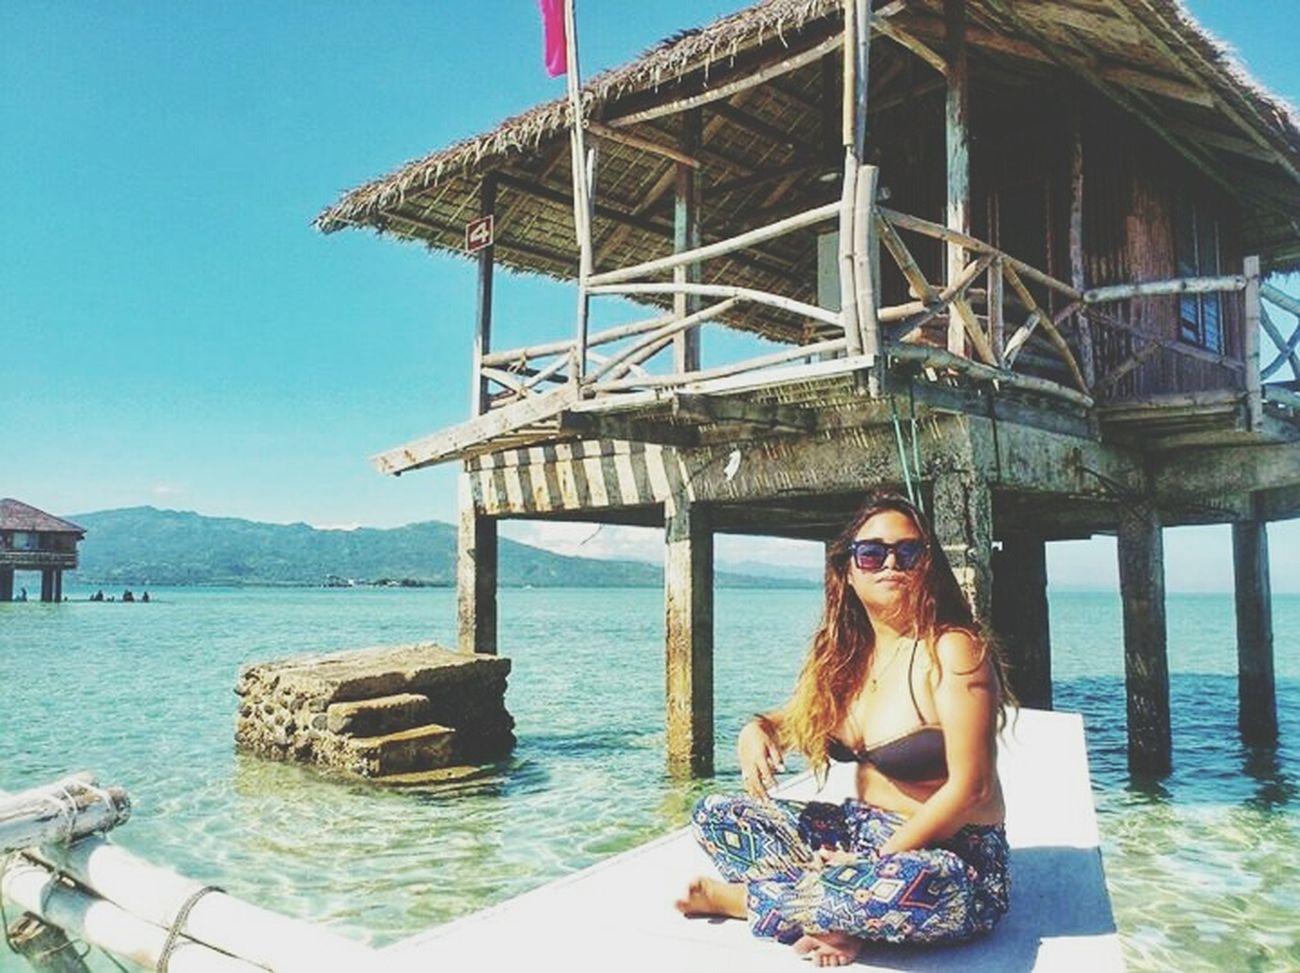 I just wanna be at the beach Paradise Beach Beach Life Nature Tropics Travel Islandlife Fashion Beachbum Tropical Paradise